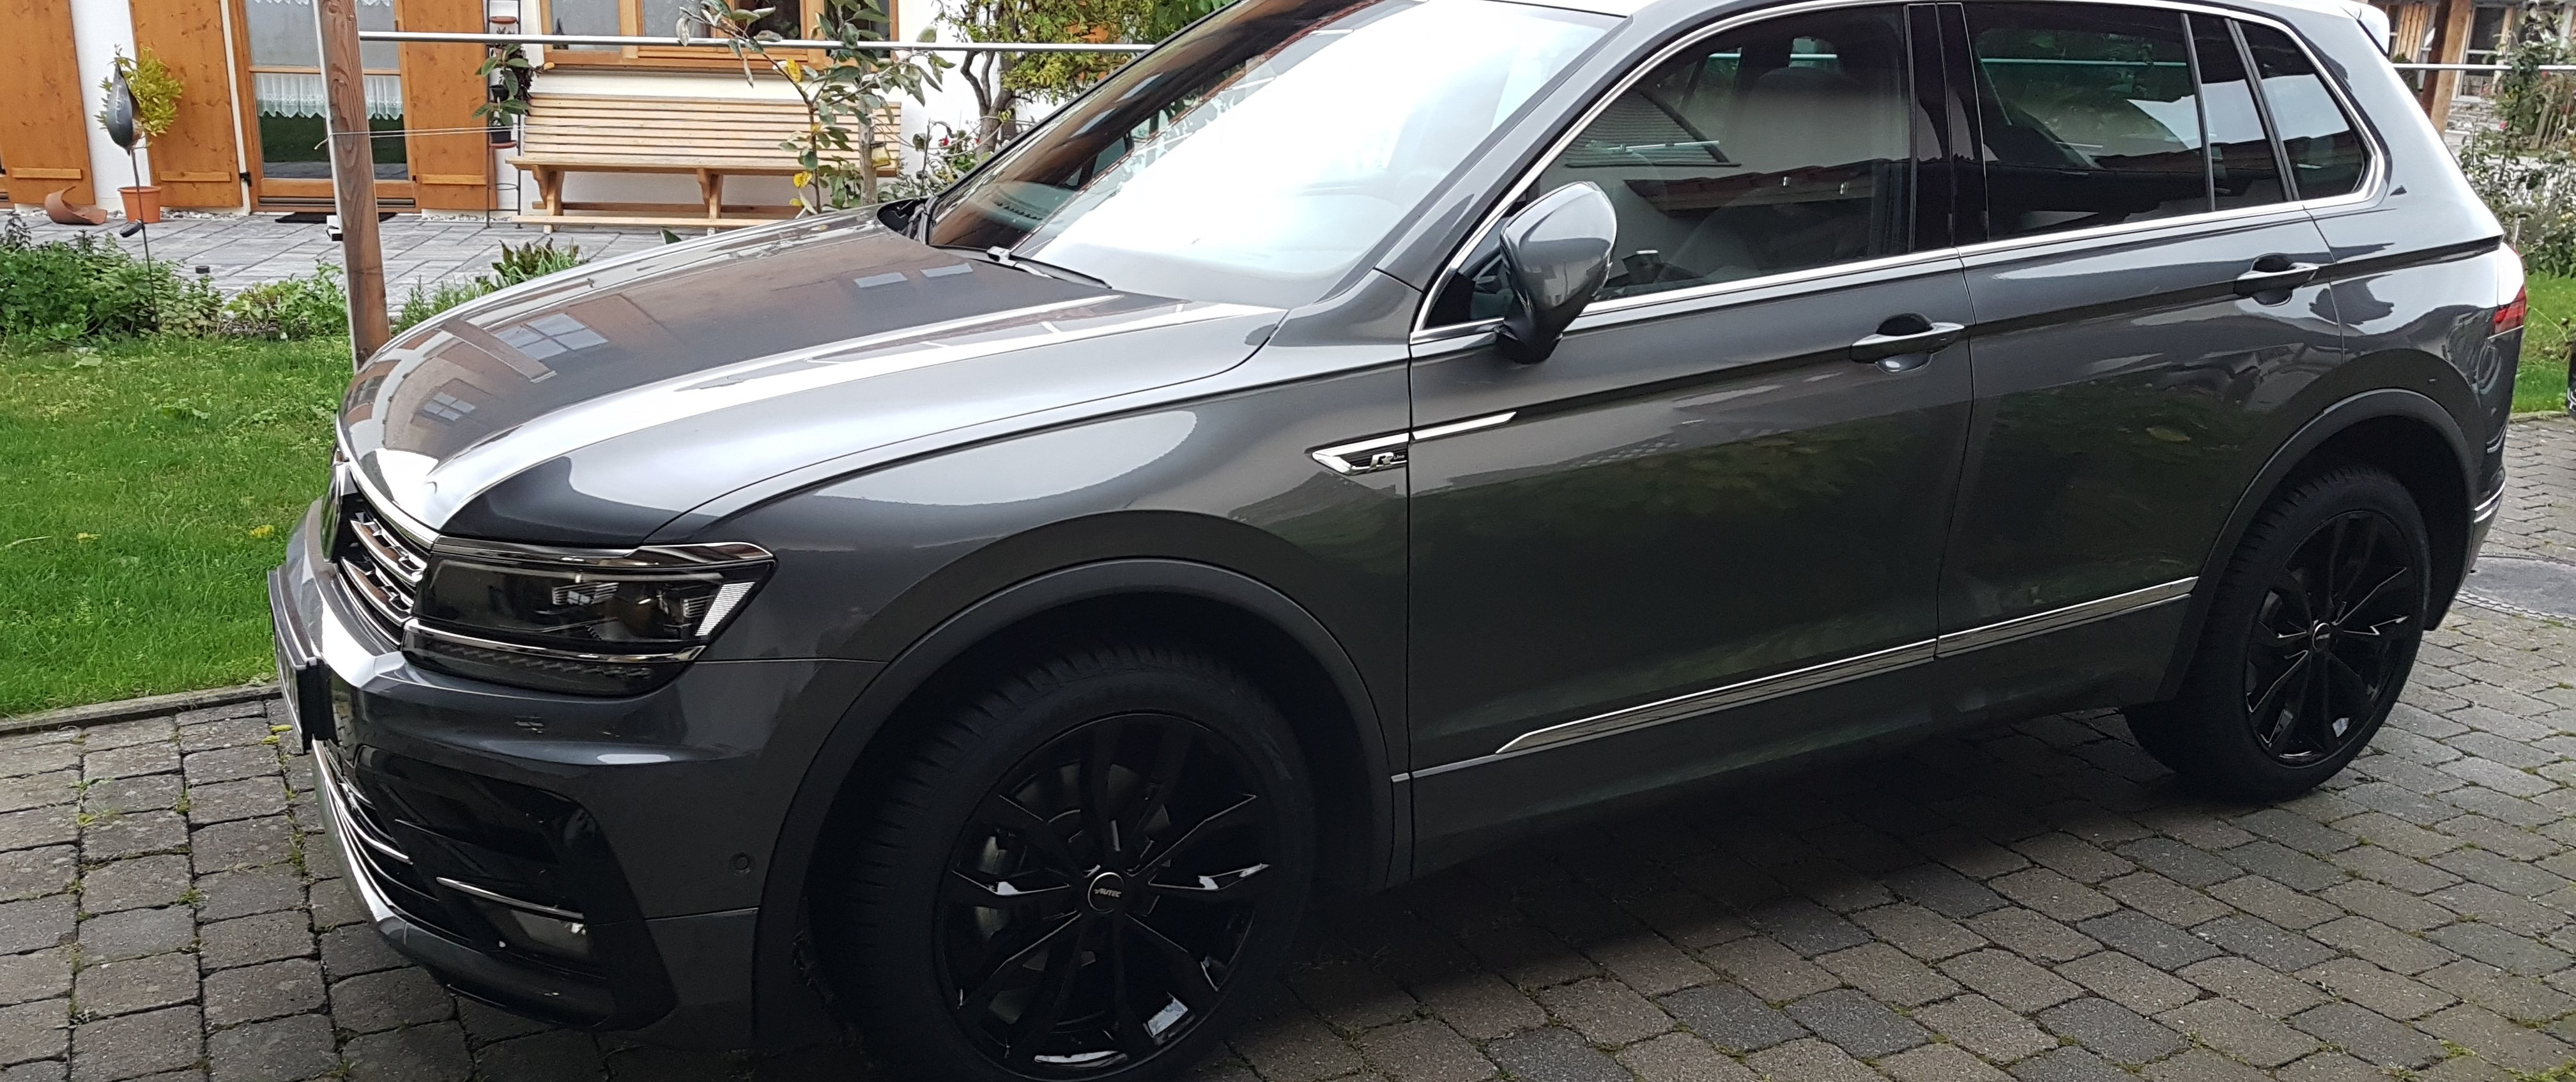 VW – Tiguan – Grau – AUTEC – Uteca – Schwarz – 19 Zoll